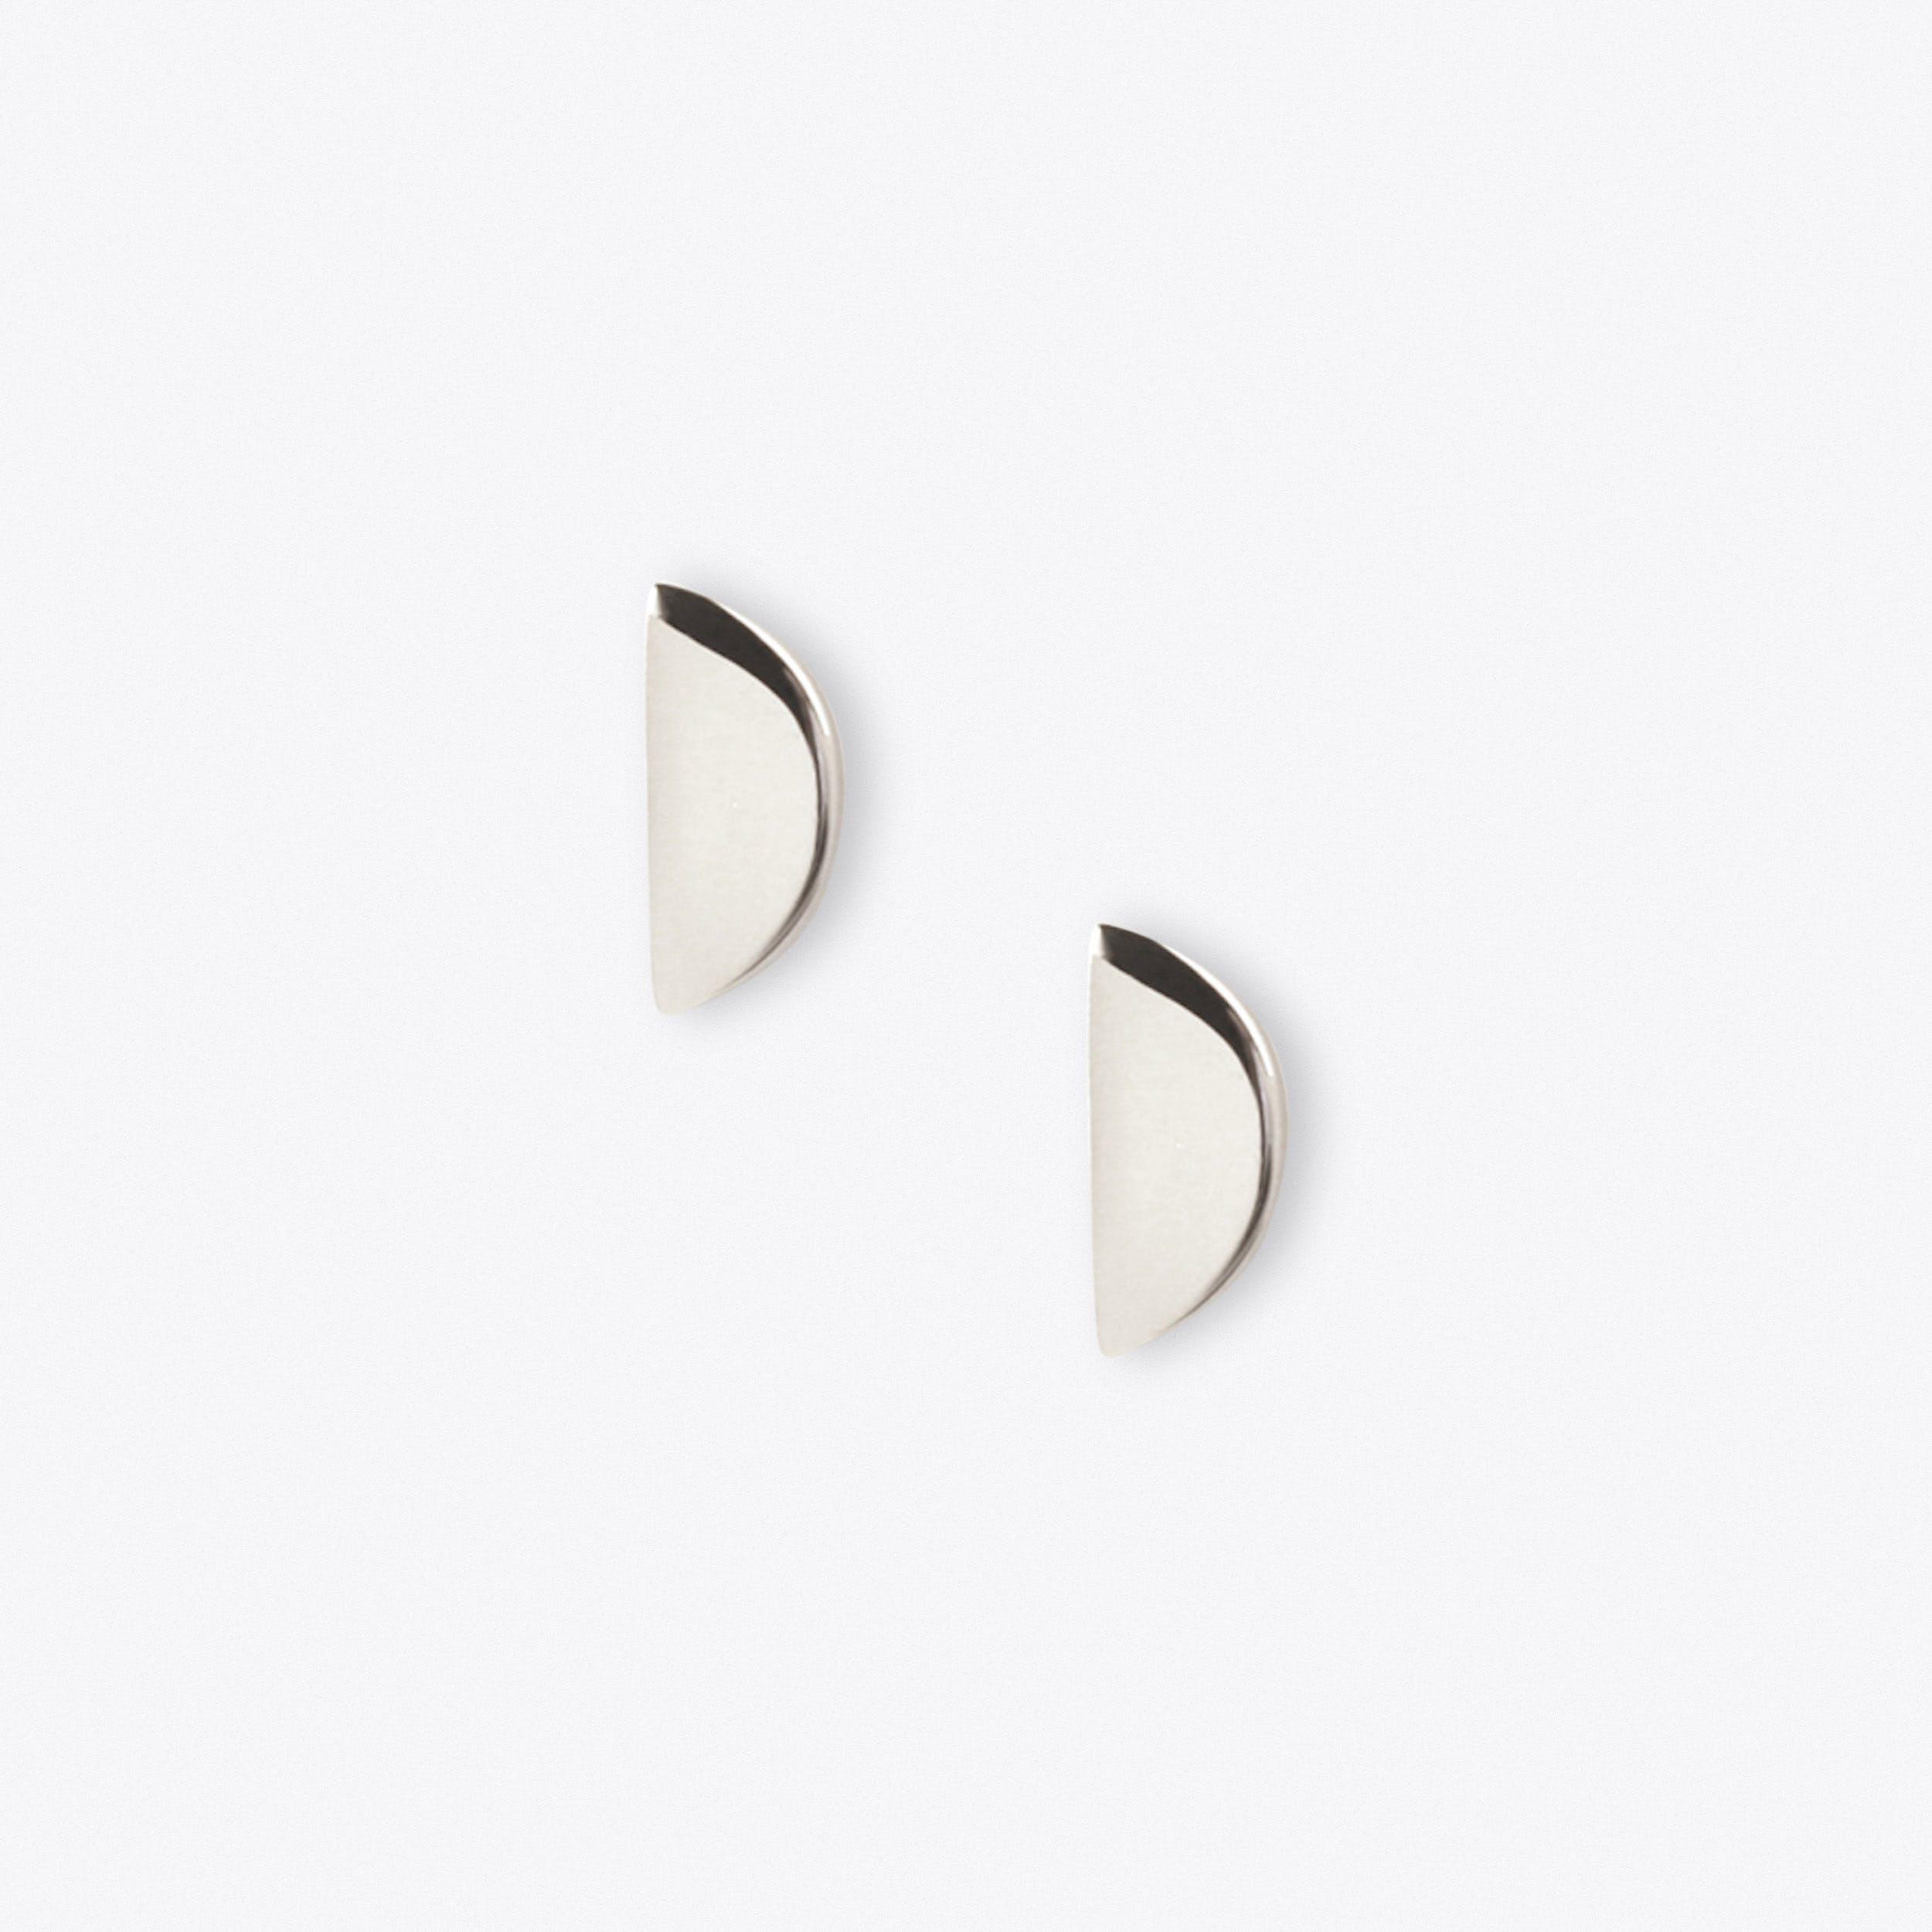 Disc Studs in Silver